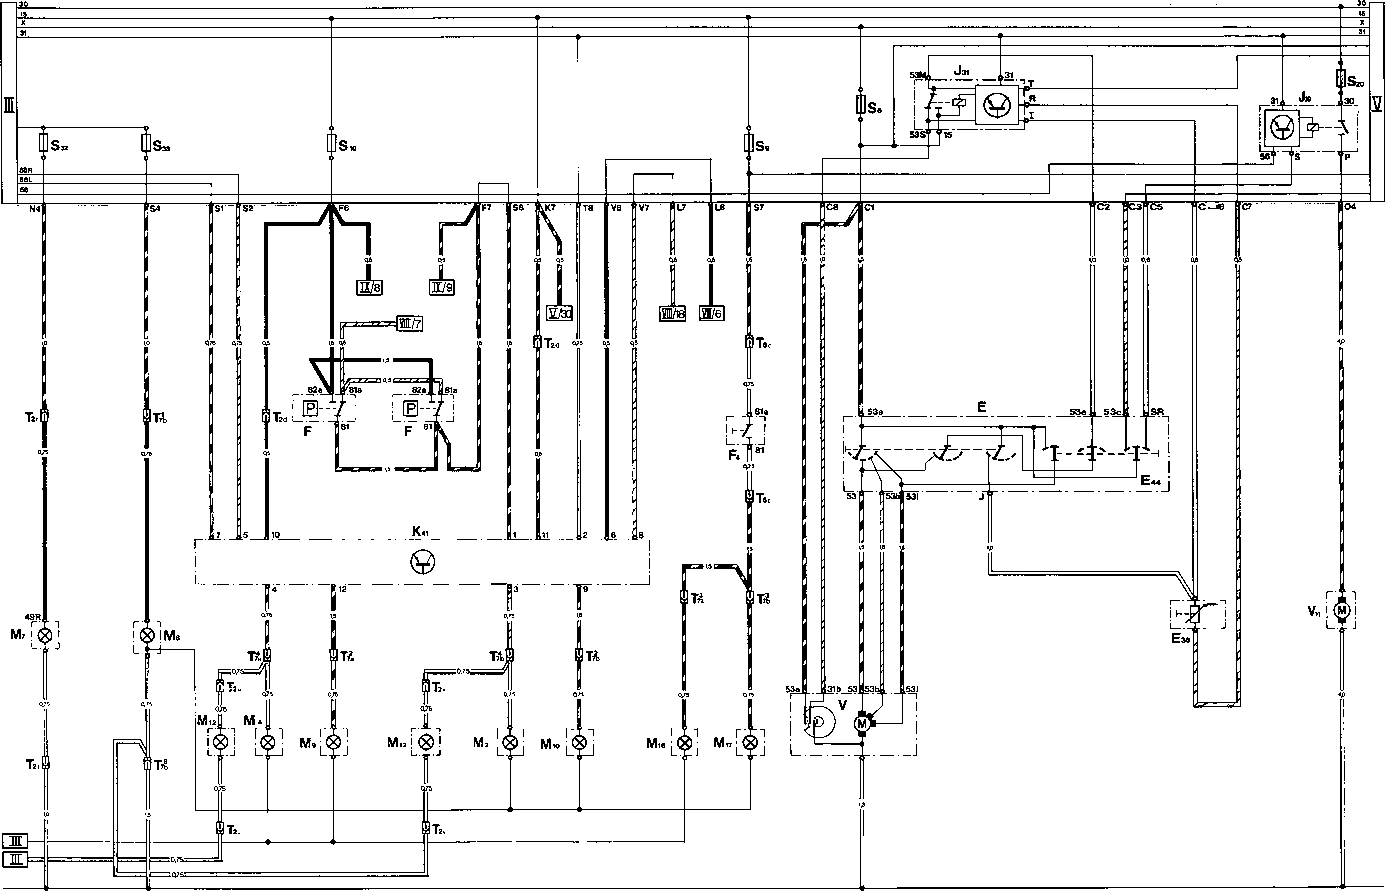 Current Flow Diagram Type 928 Usa Part Iv